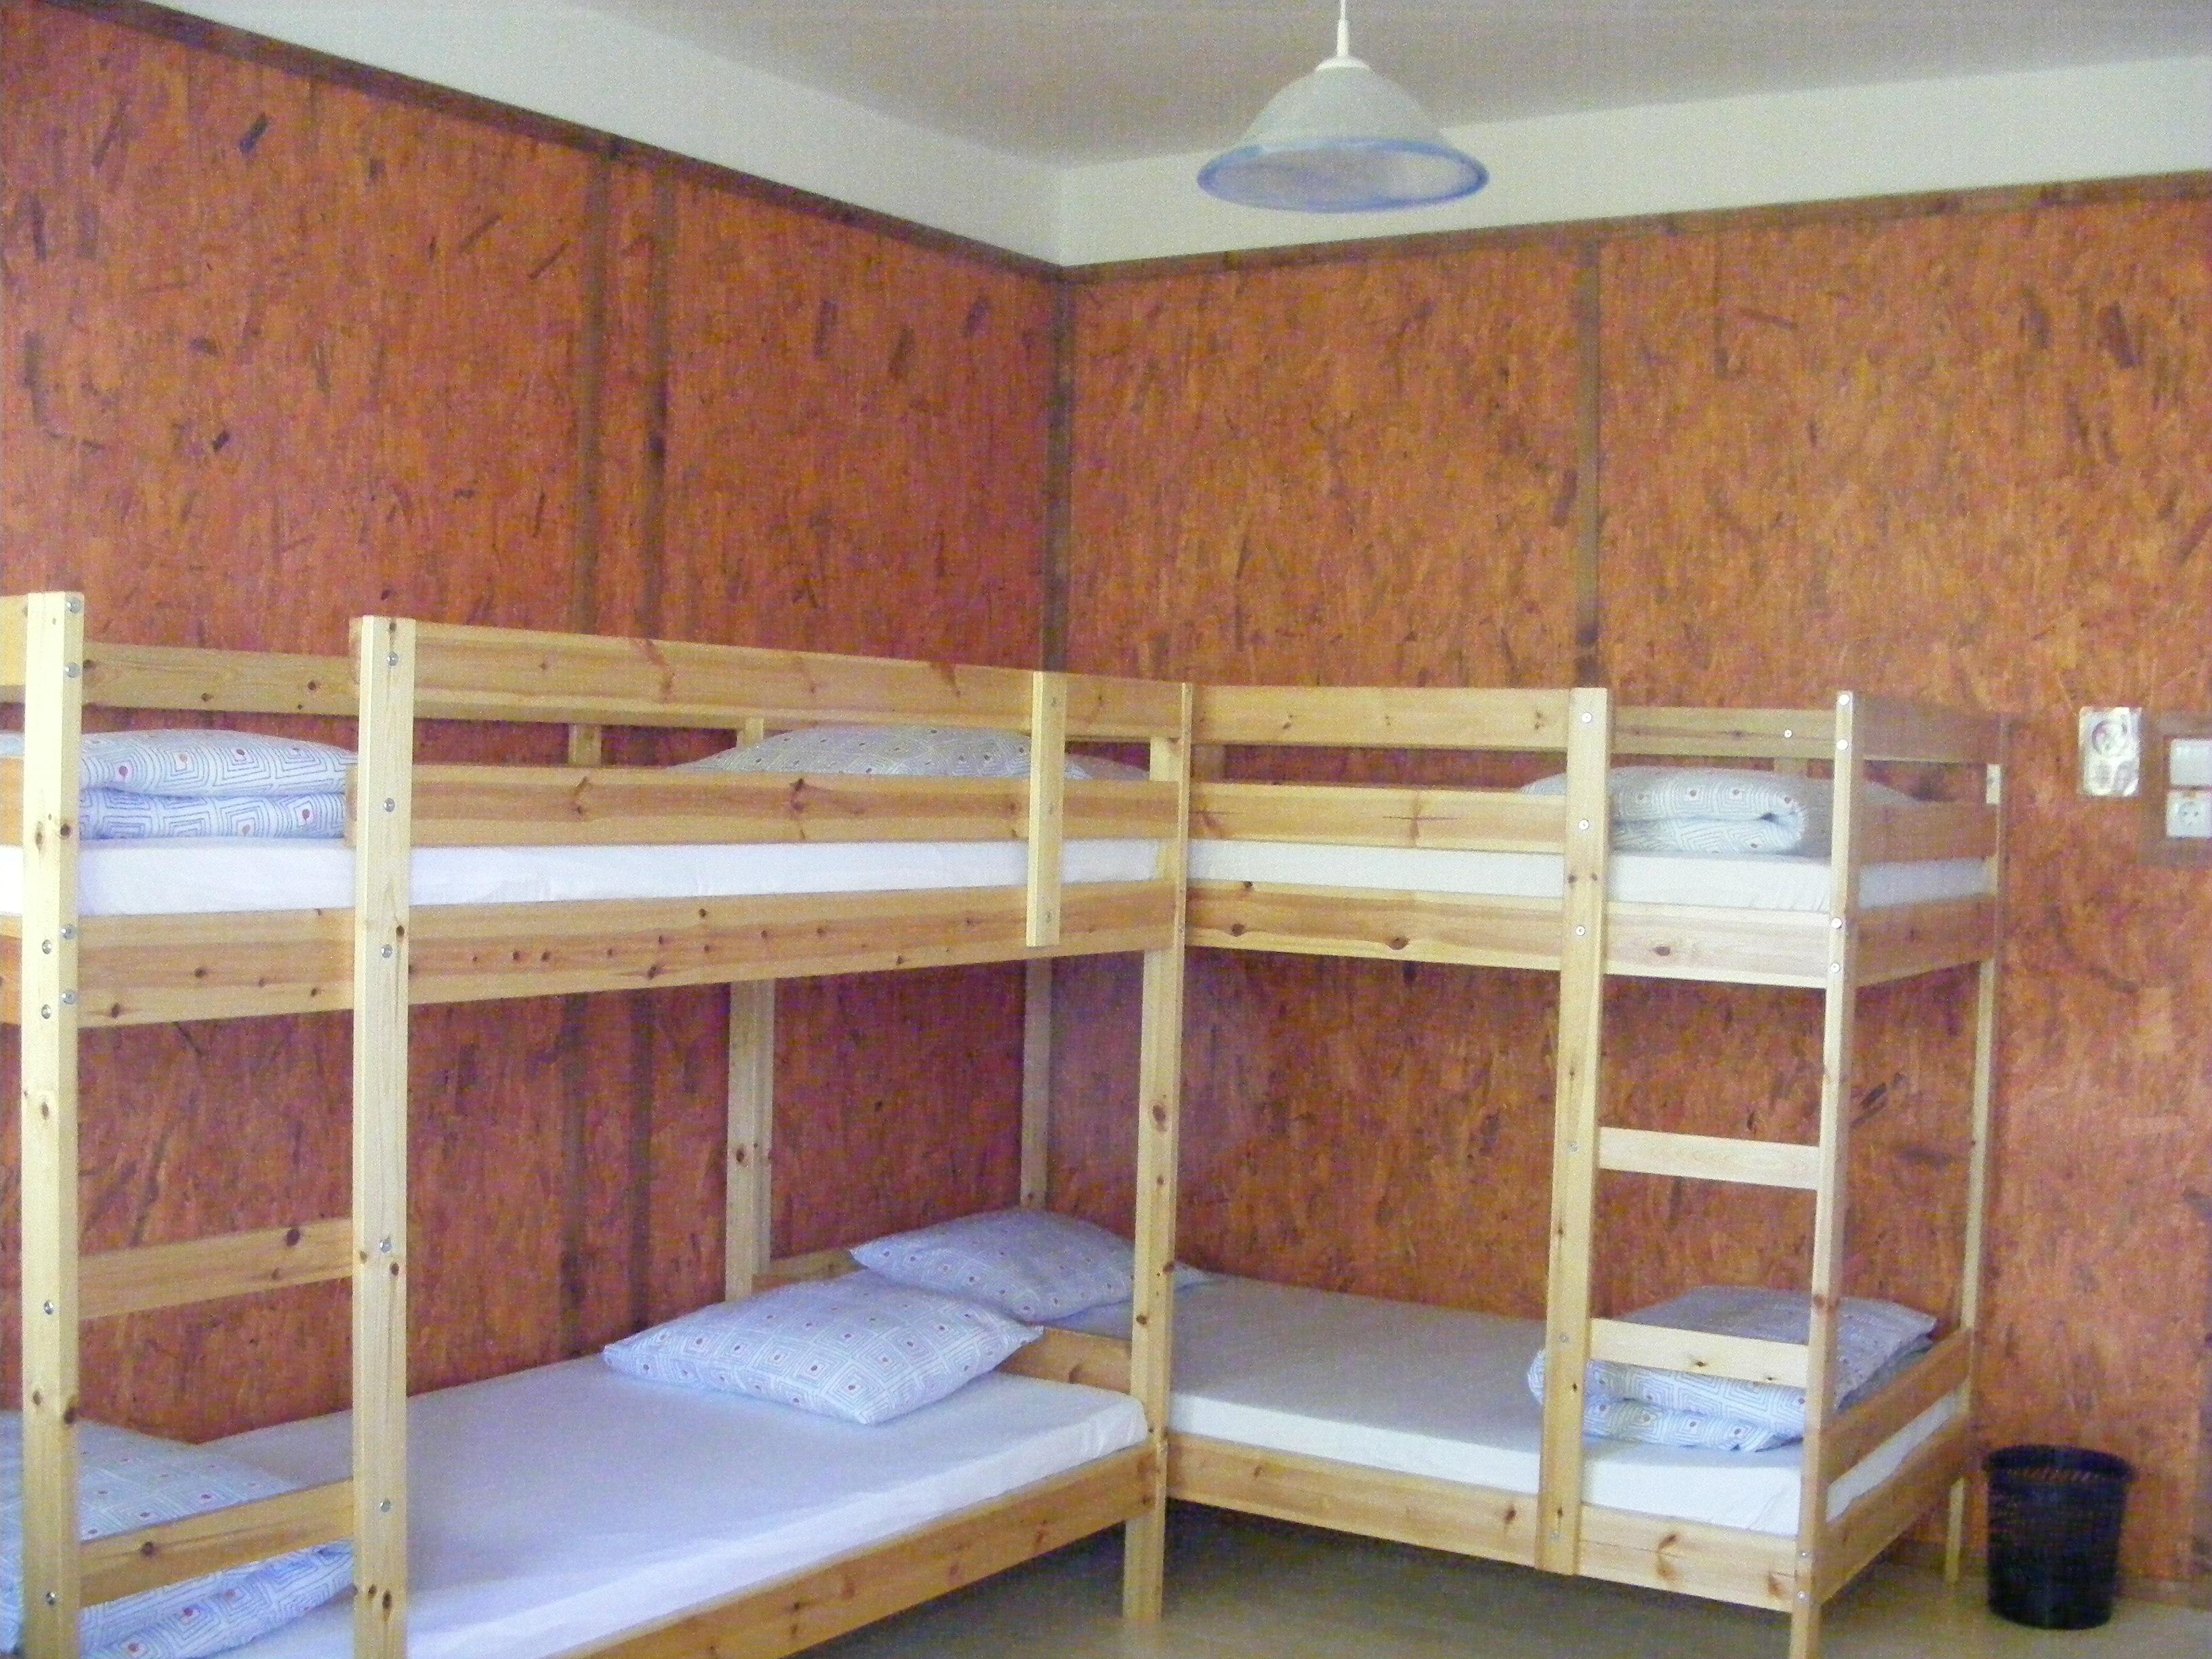 dorm_room1